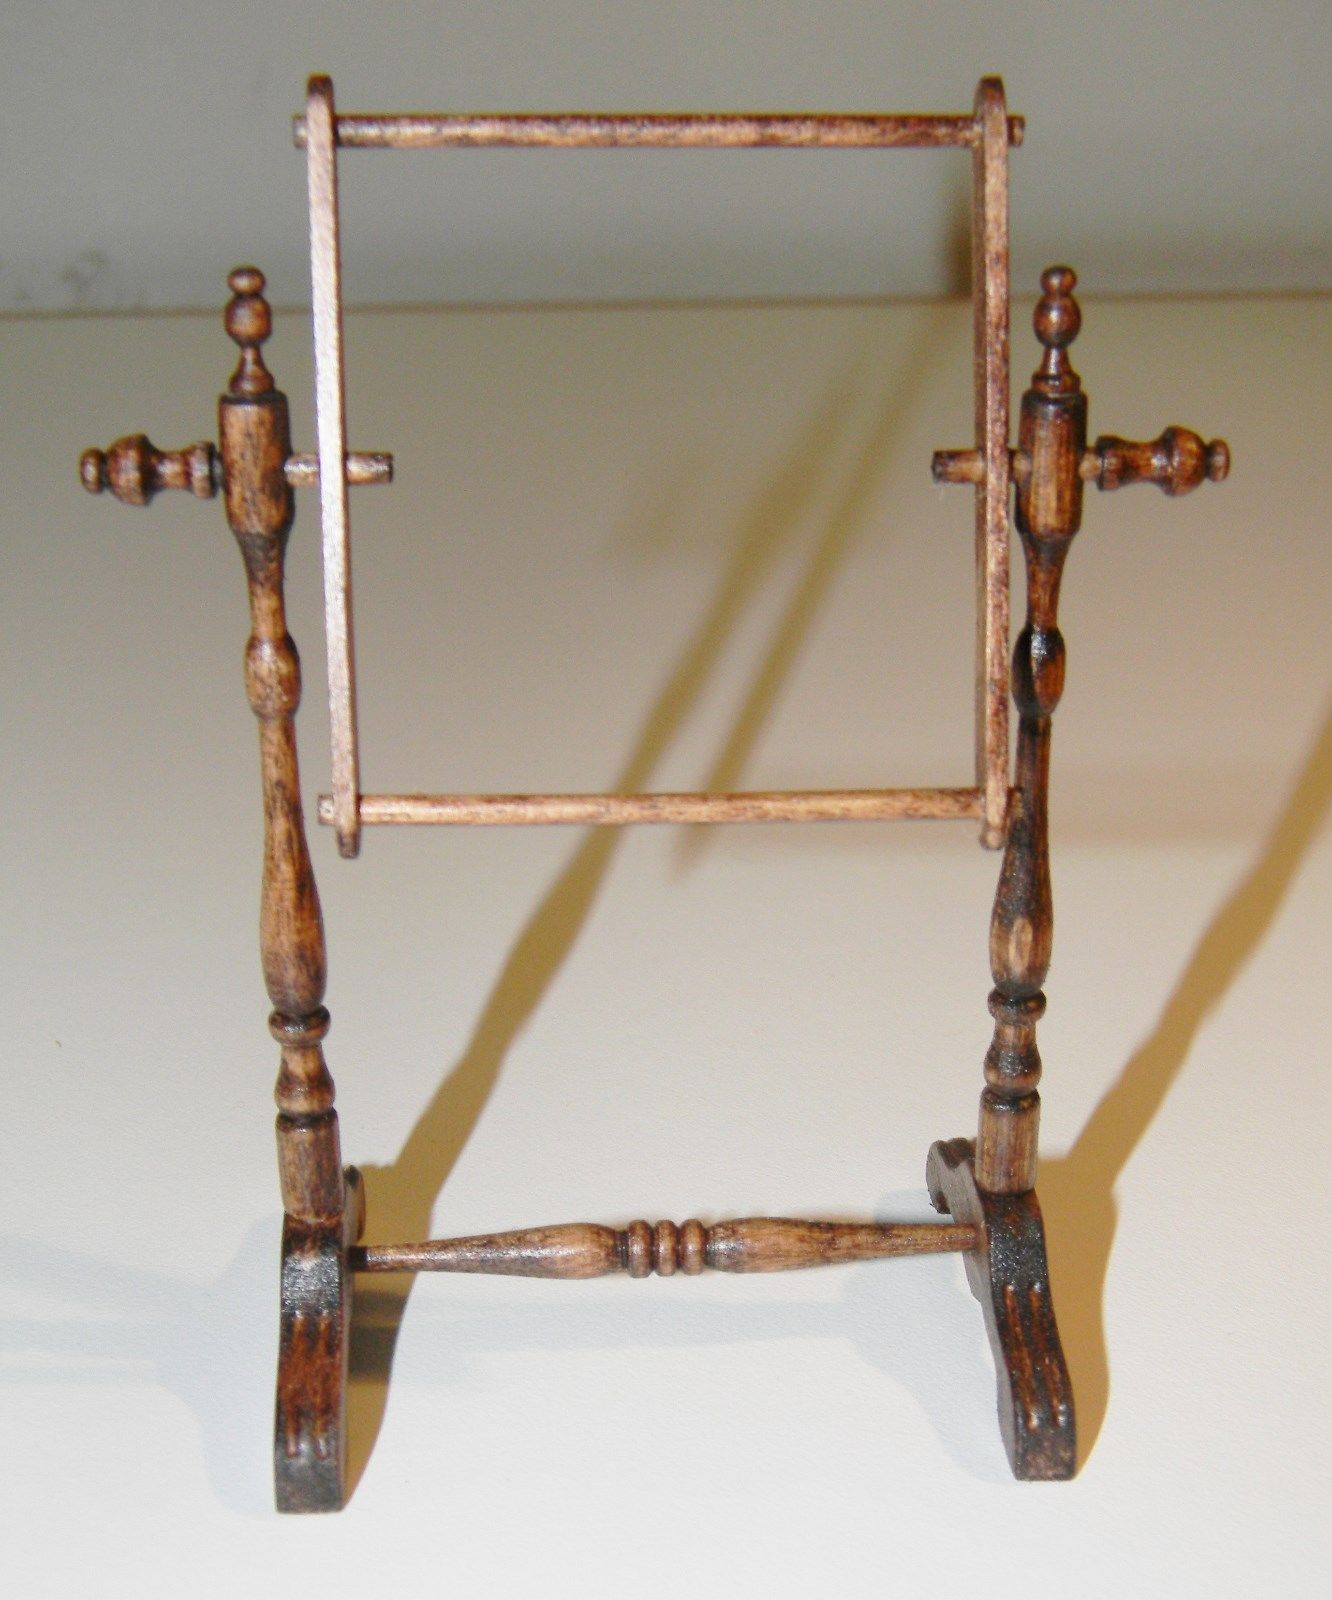 David Krupick Needlepoint Frame 1 12th Scale | eBay | miniatures ...